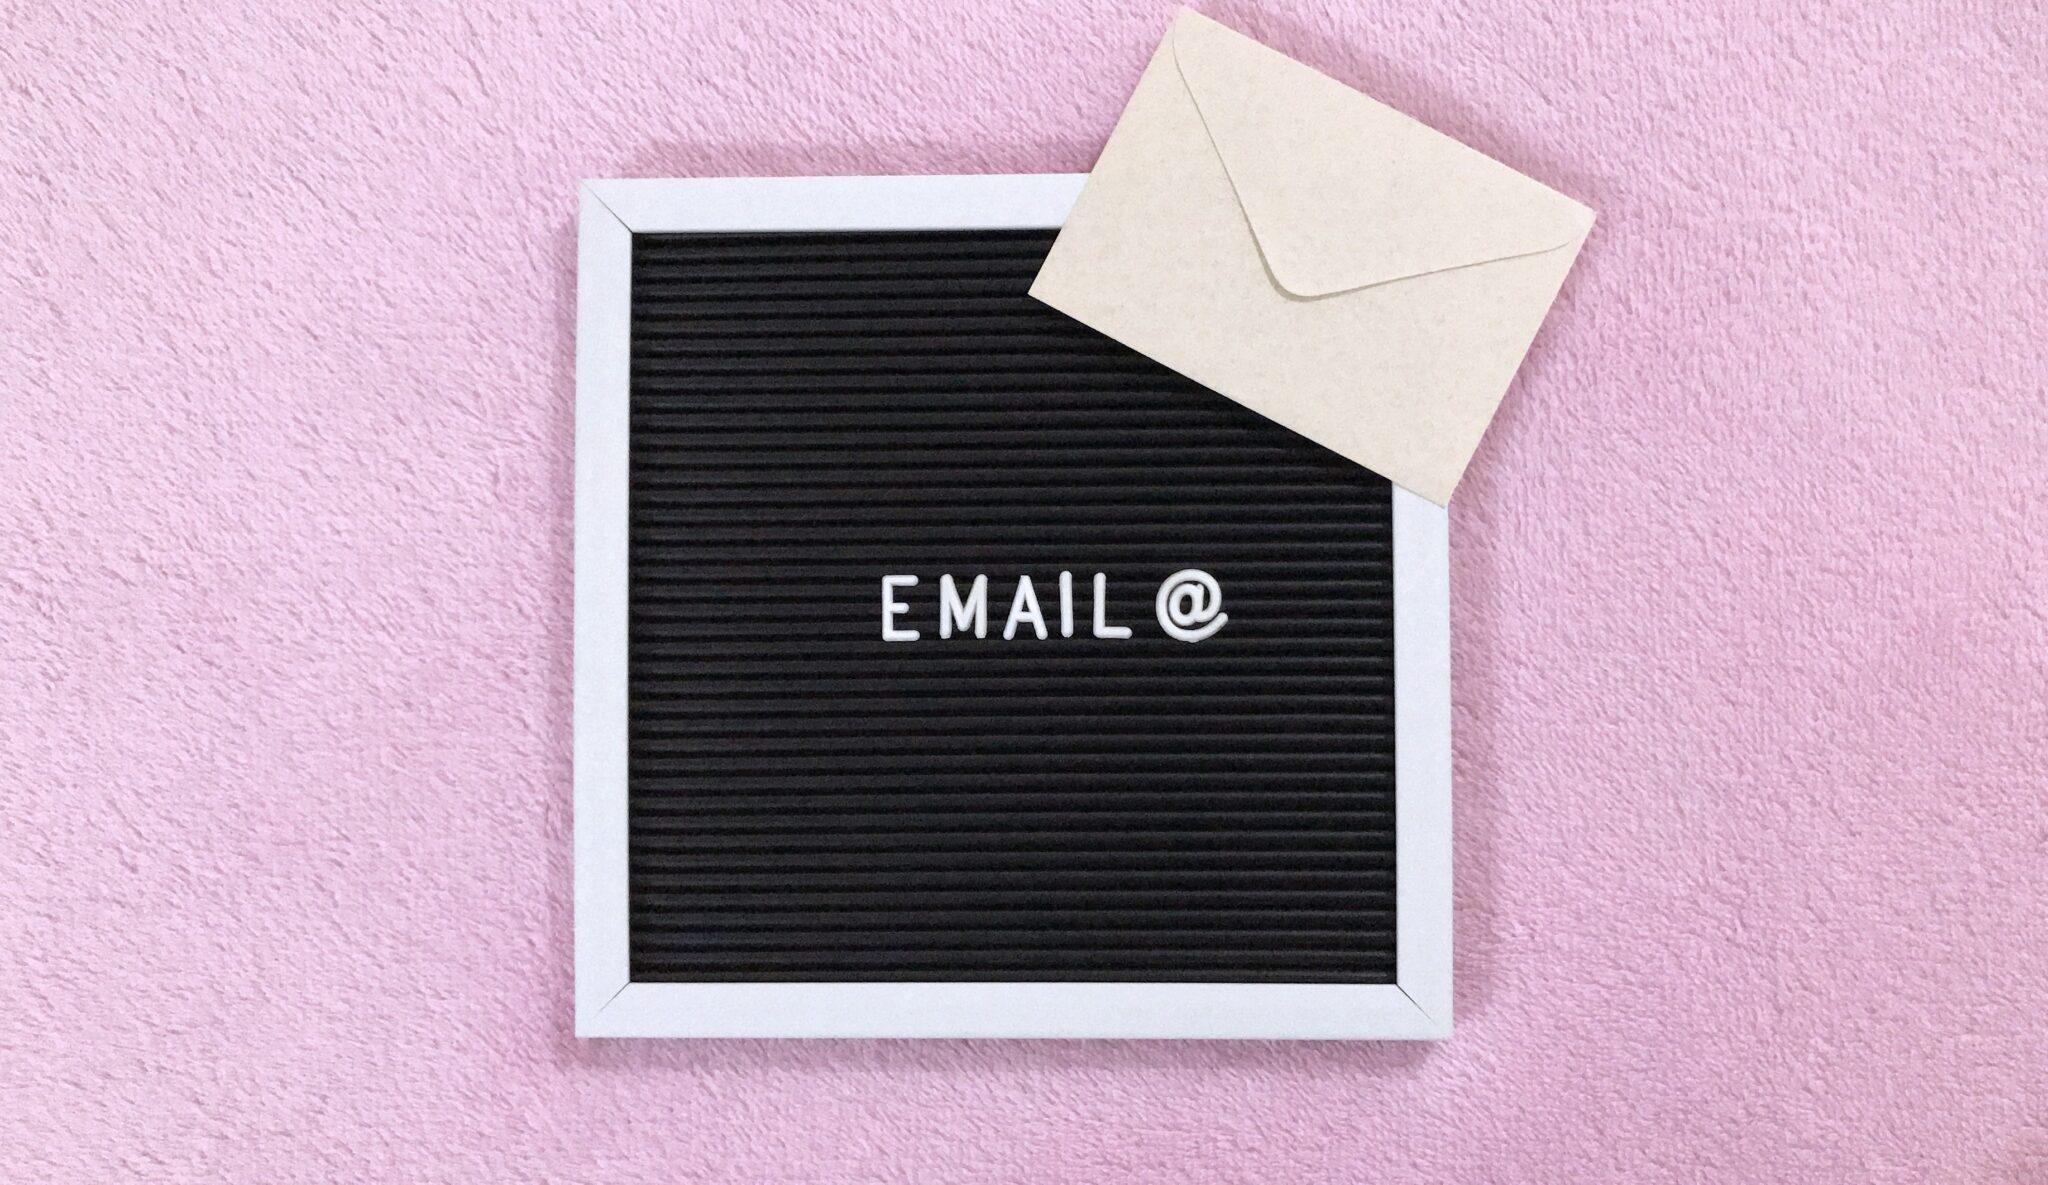 OrangEdge Marketing Home email sign board on pink background PBFJ965 scaled 8